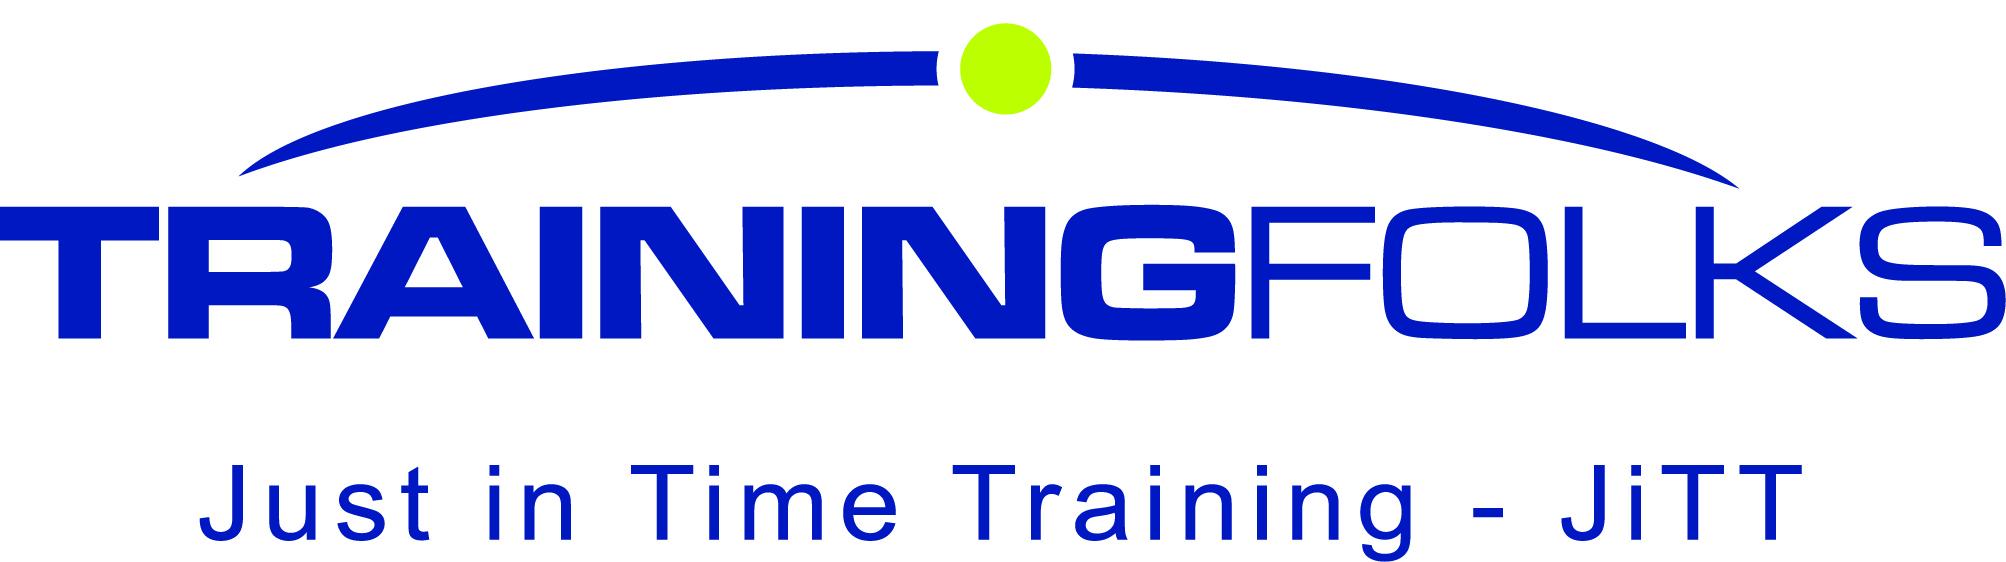 Corporate Training Companies